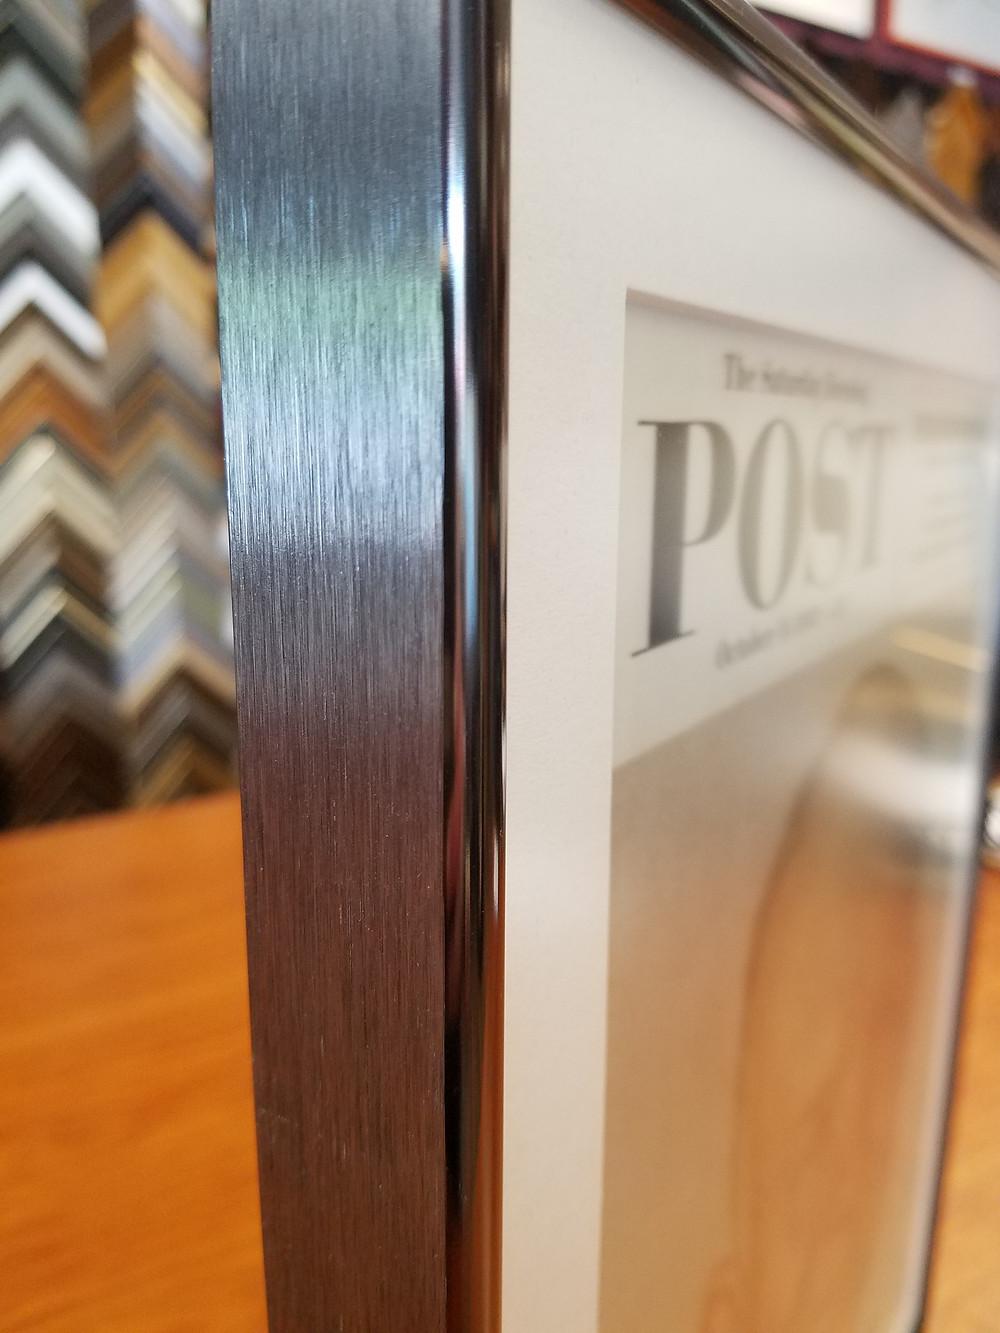 versatile metal frame for both modern and antique prints